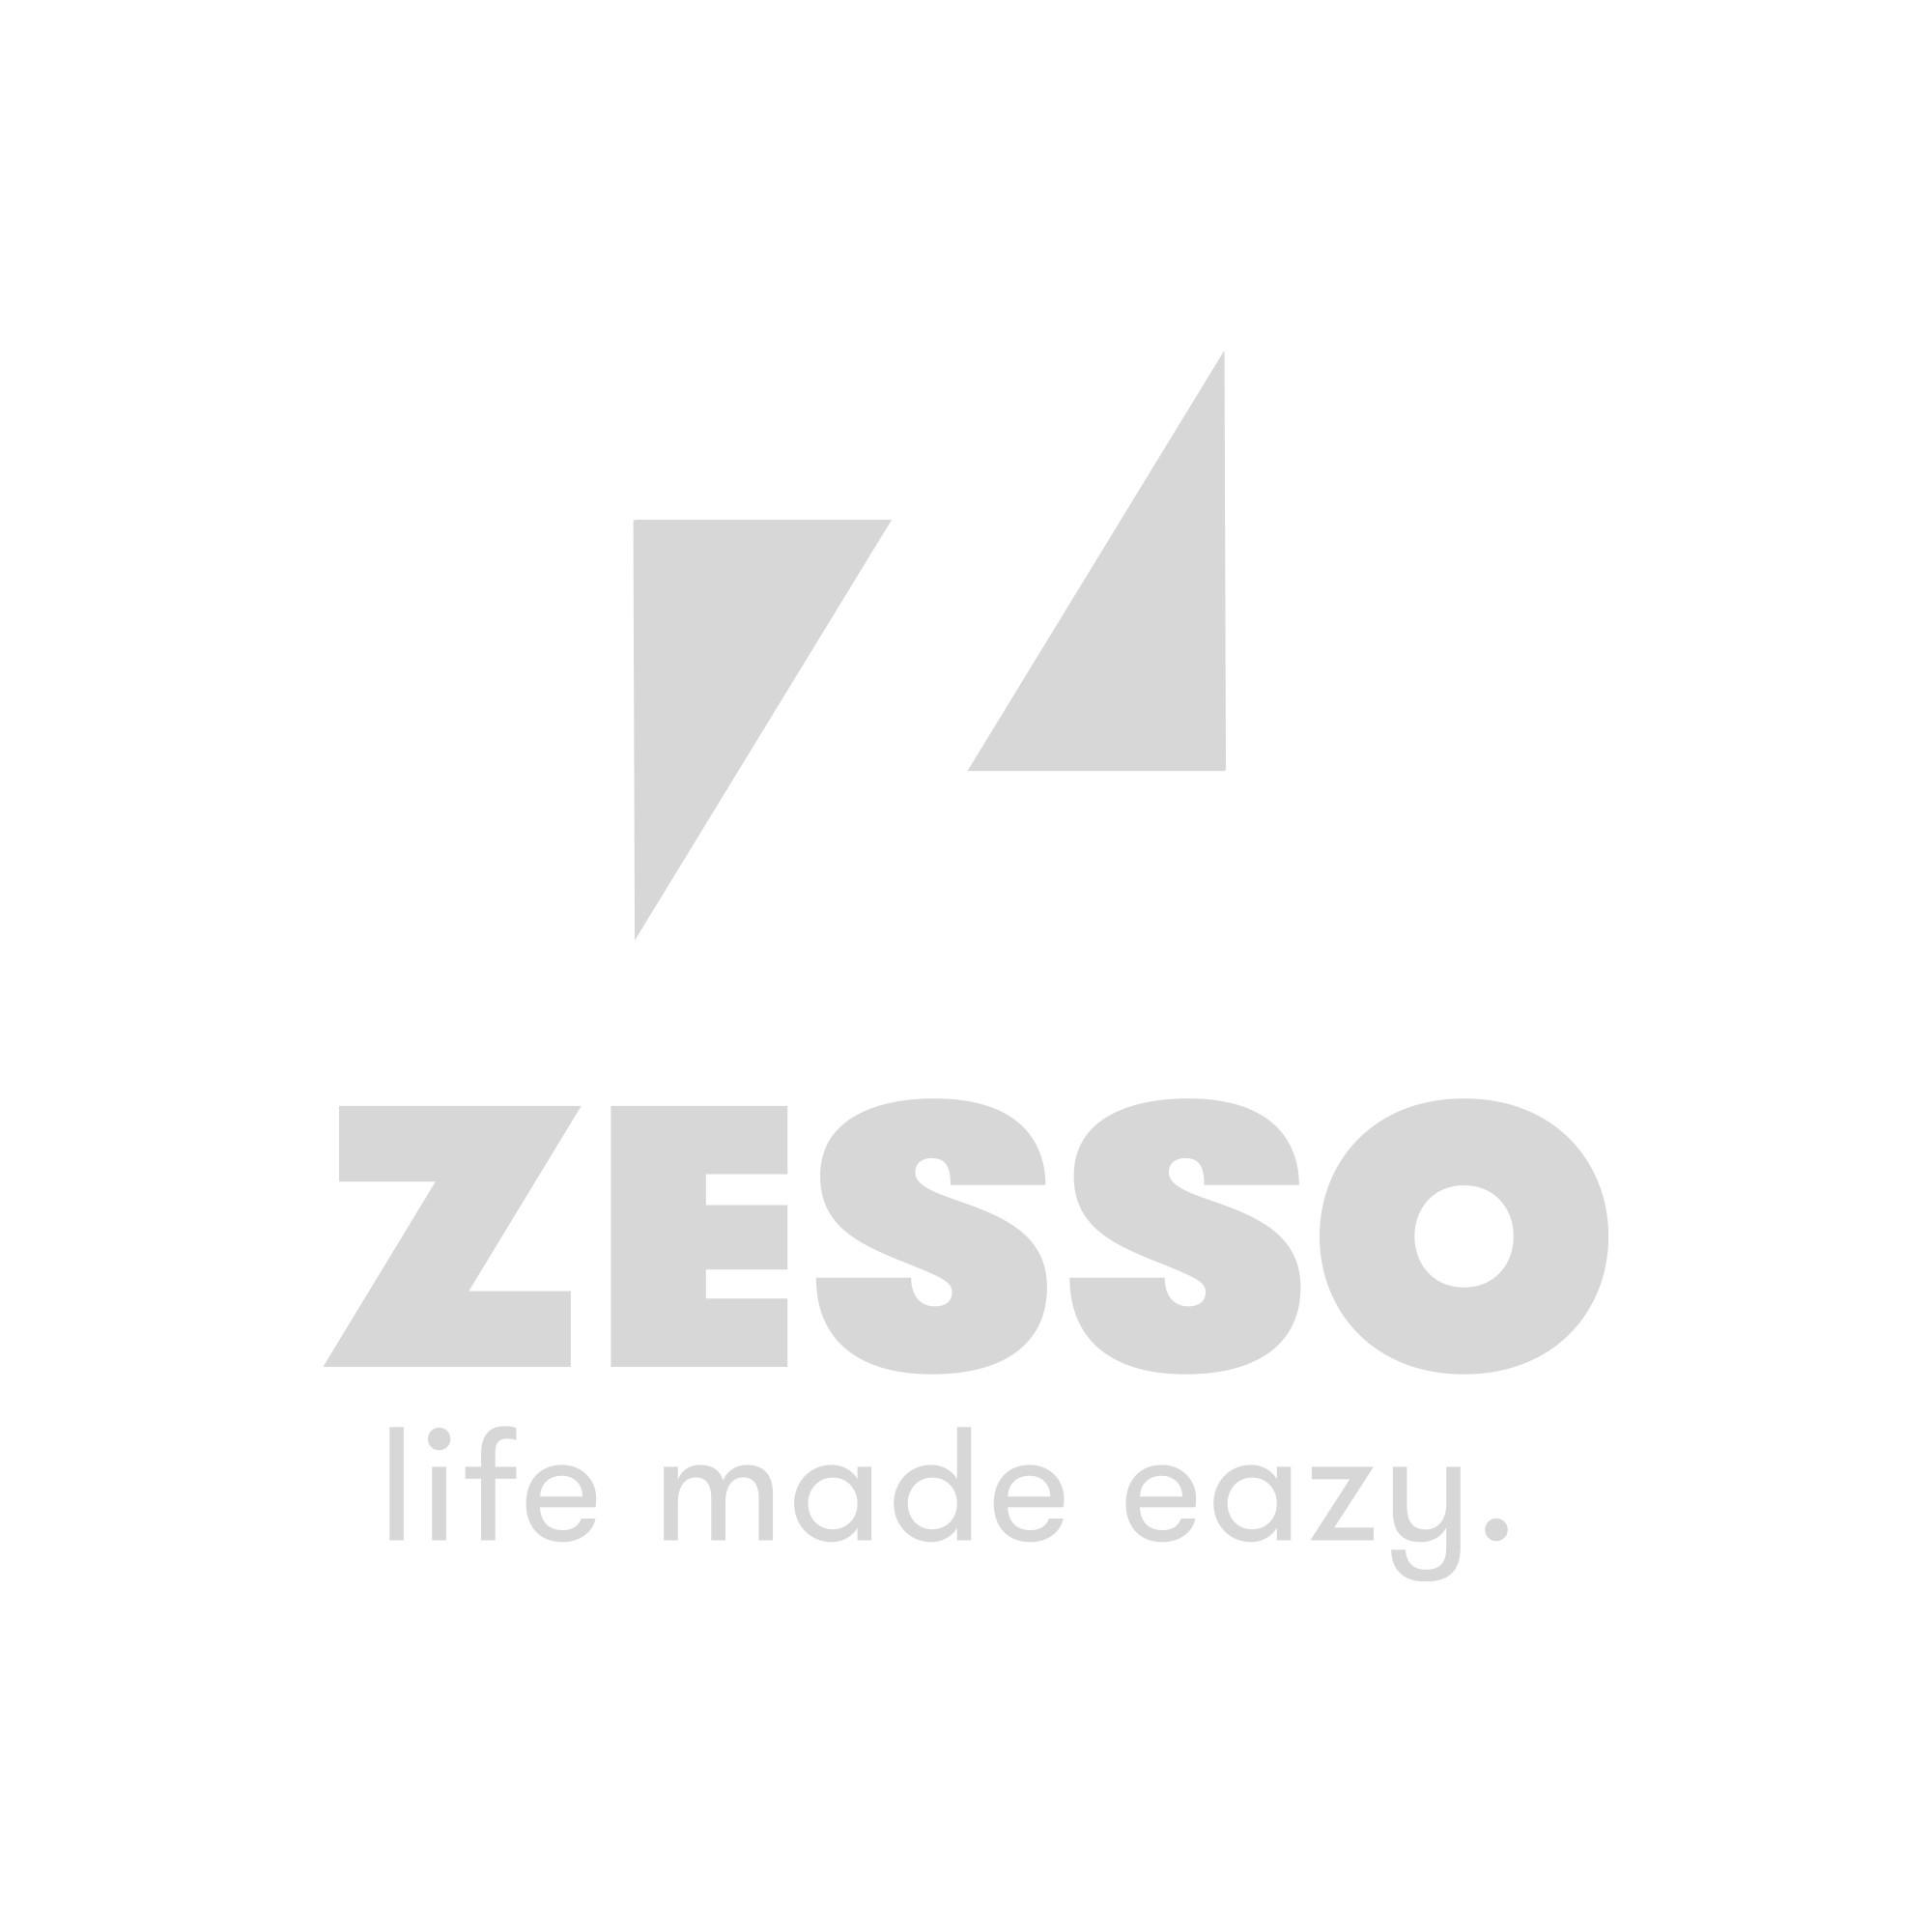 Nesthaus Tapijt 160 cm x 230 cm Lisa Blauw